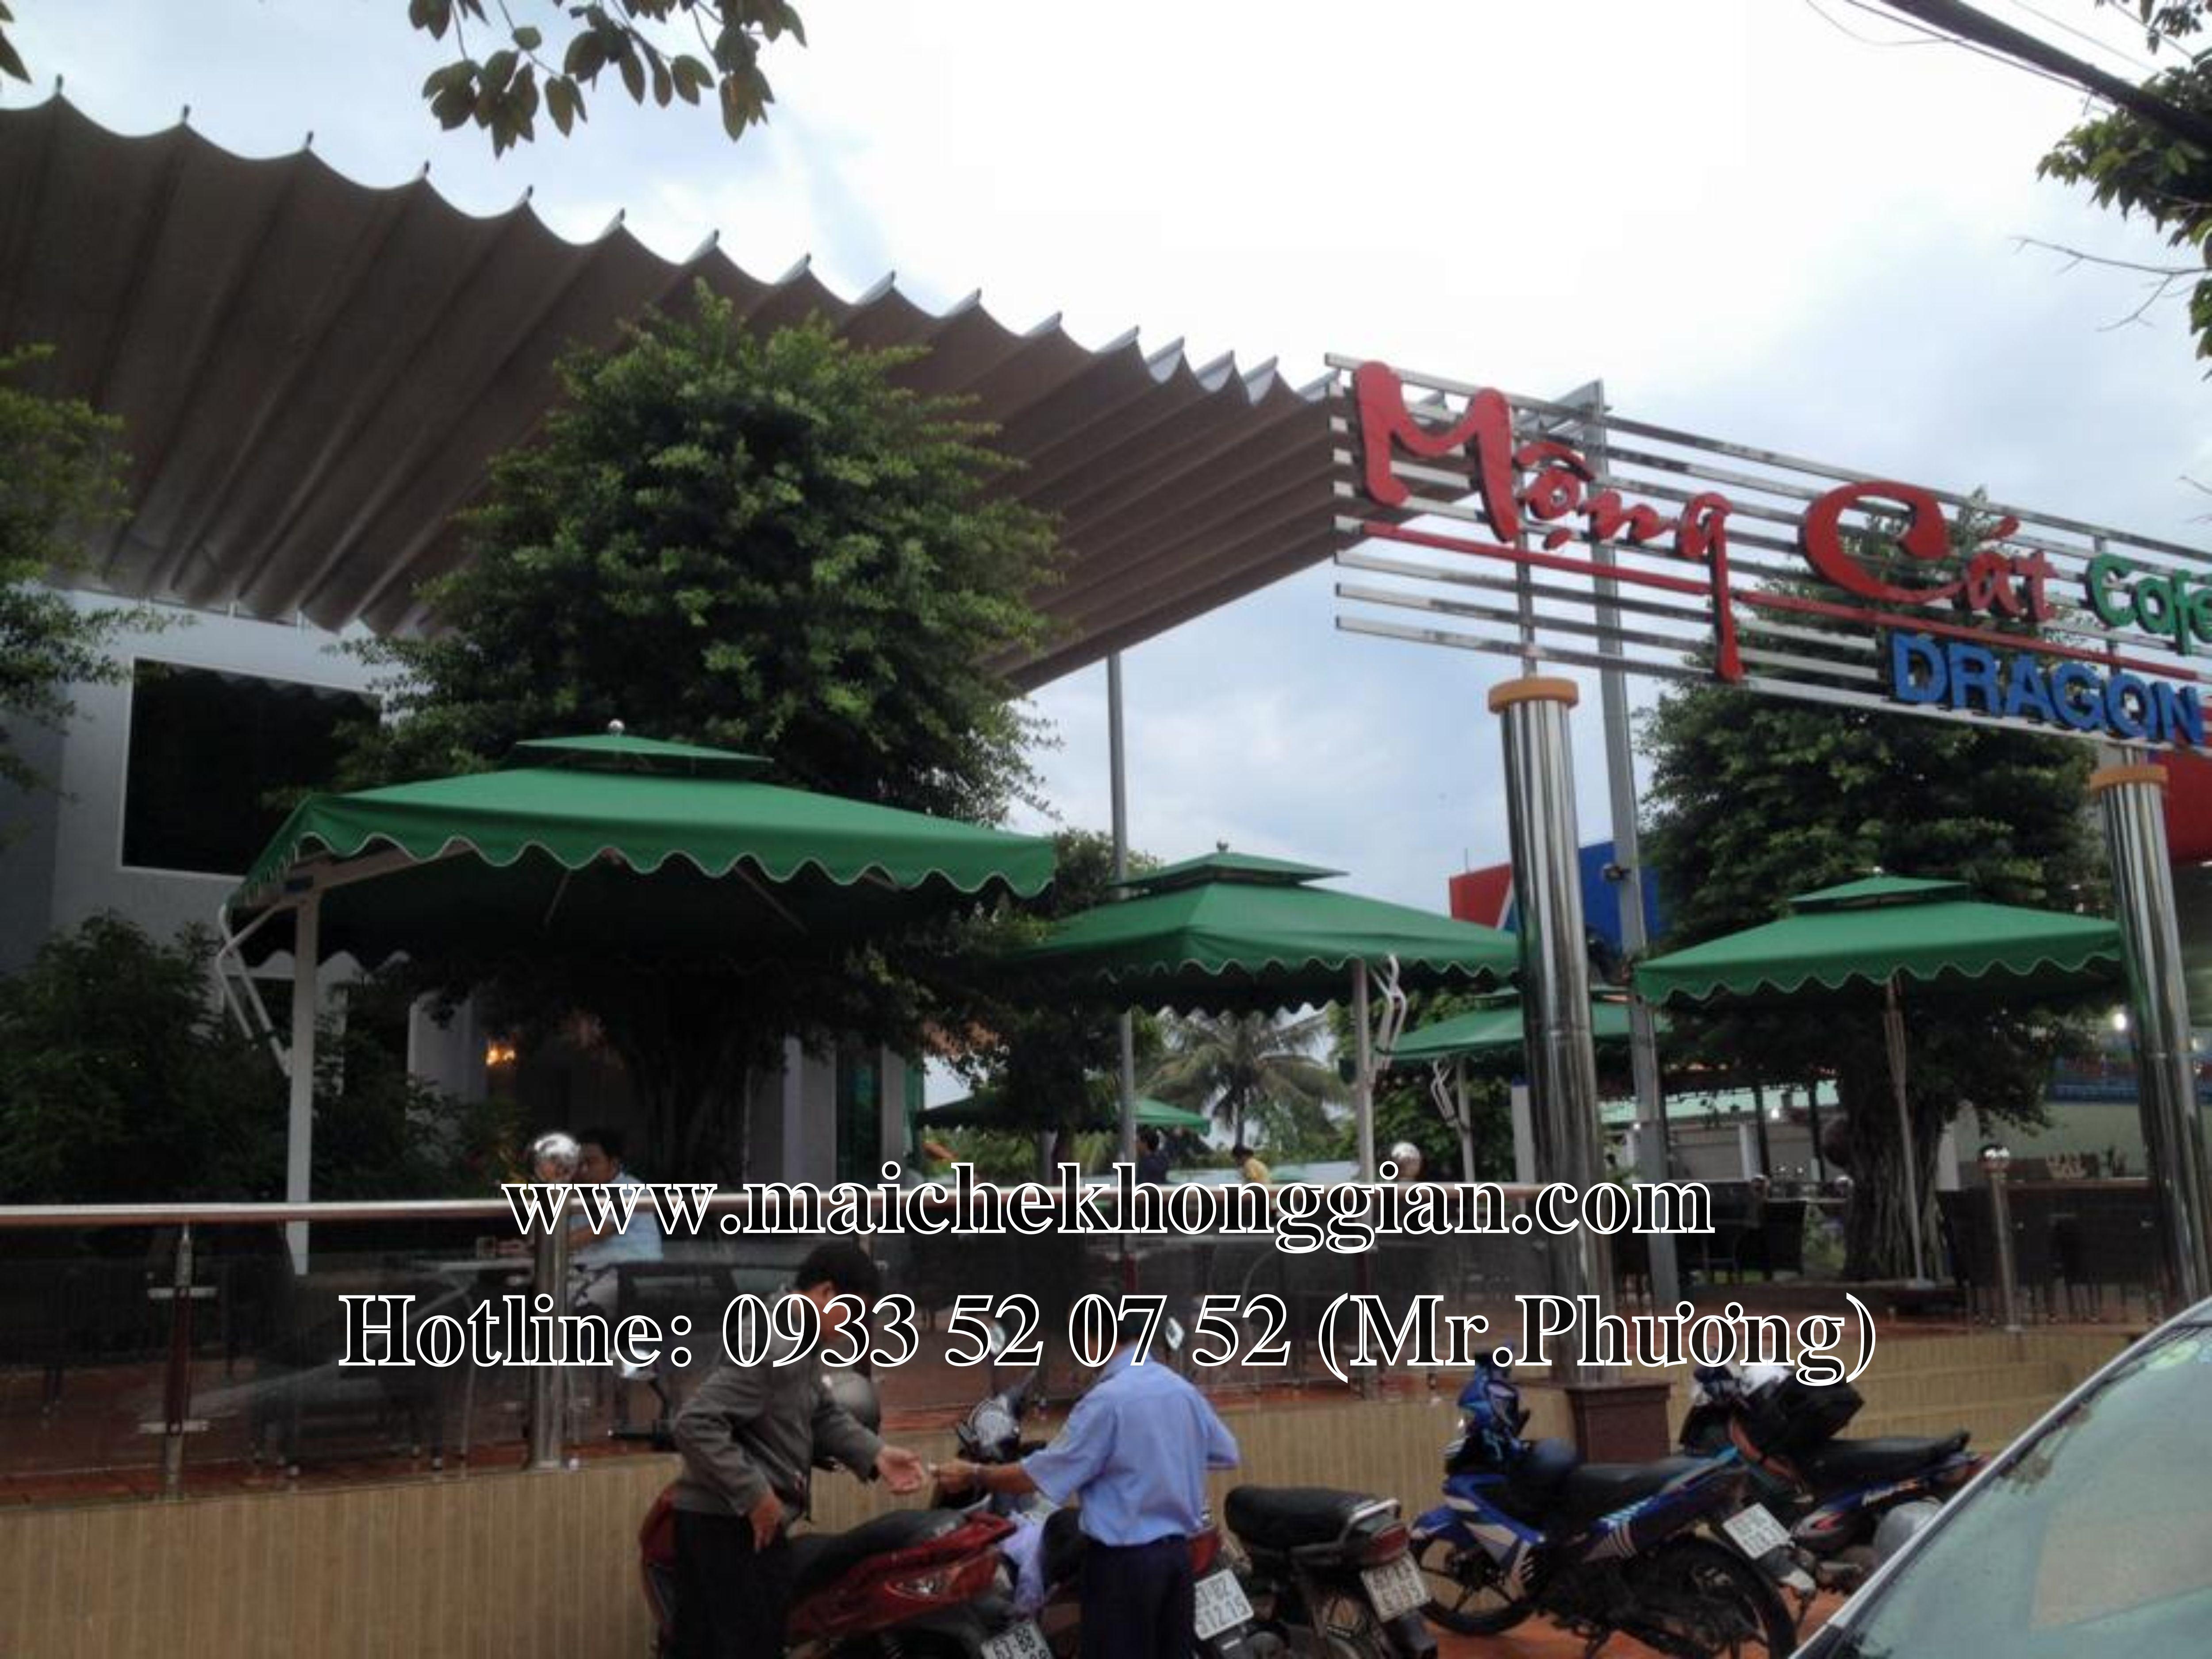 Mái xếp Quận 10 TP Hồ Chí Minh